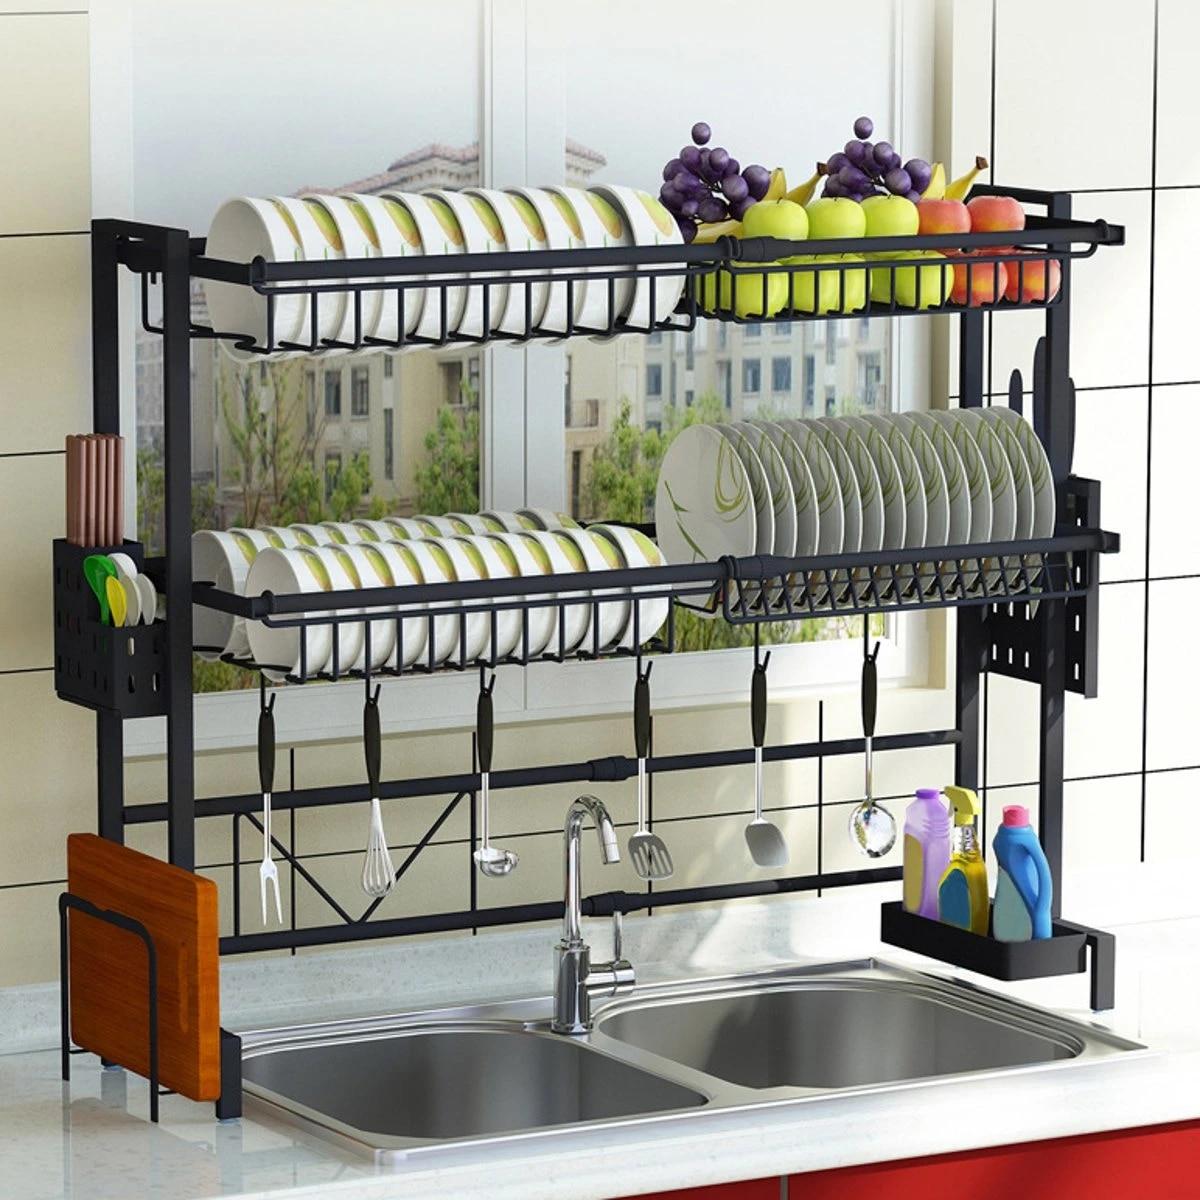 Multi Use Stainless Steel Dishes Rack Dual Sink Drain Rack Adjustable Kitchen Oragnizer Rack Dish Shelf Sink Drying Rack 1 2tier Racks Holders Aliexpress